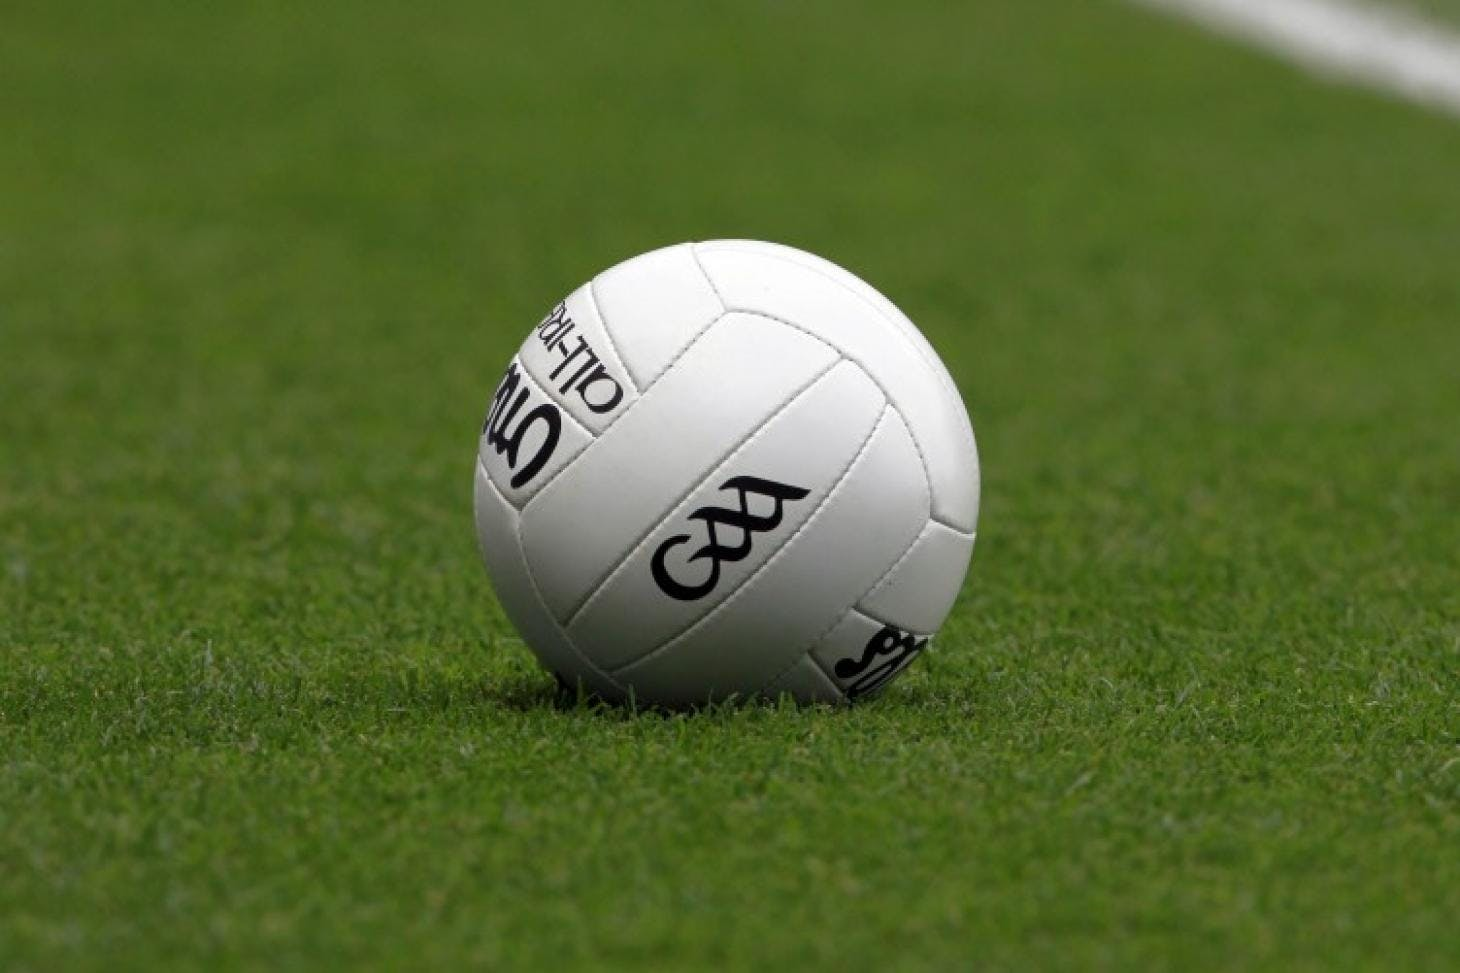 Raheny GAA Club Training | Astroturf gaa pitch